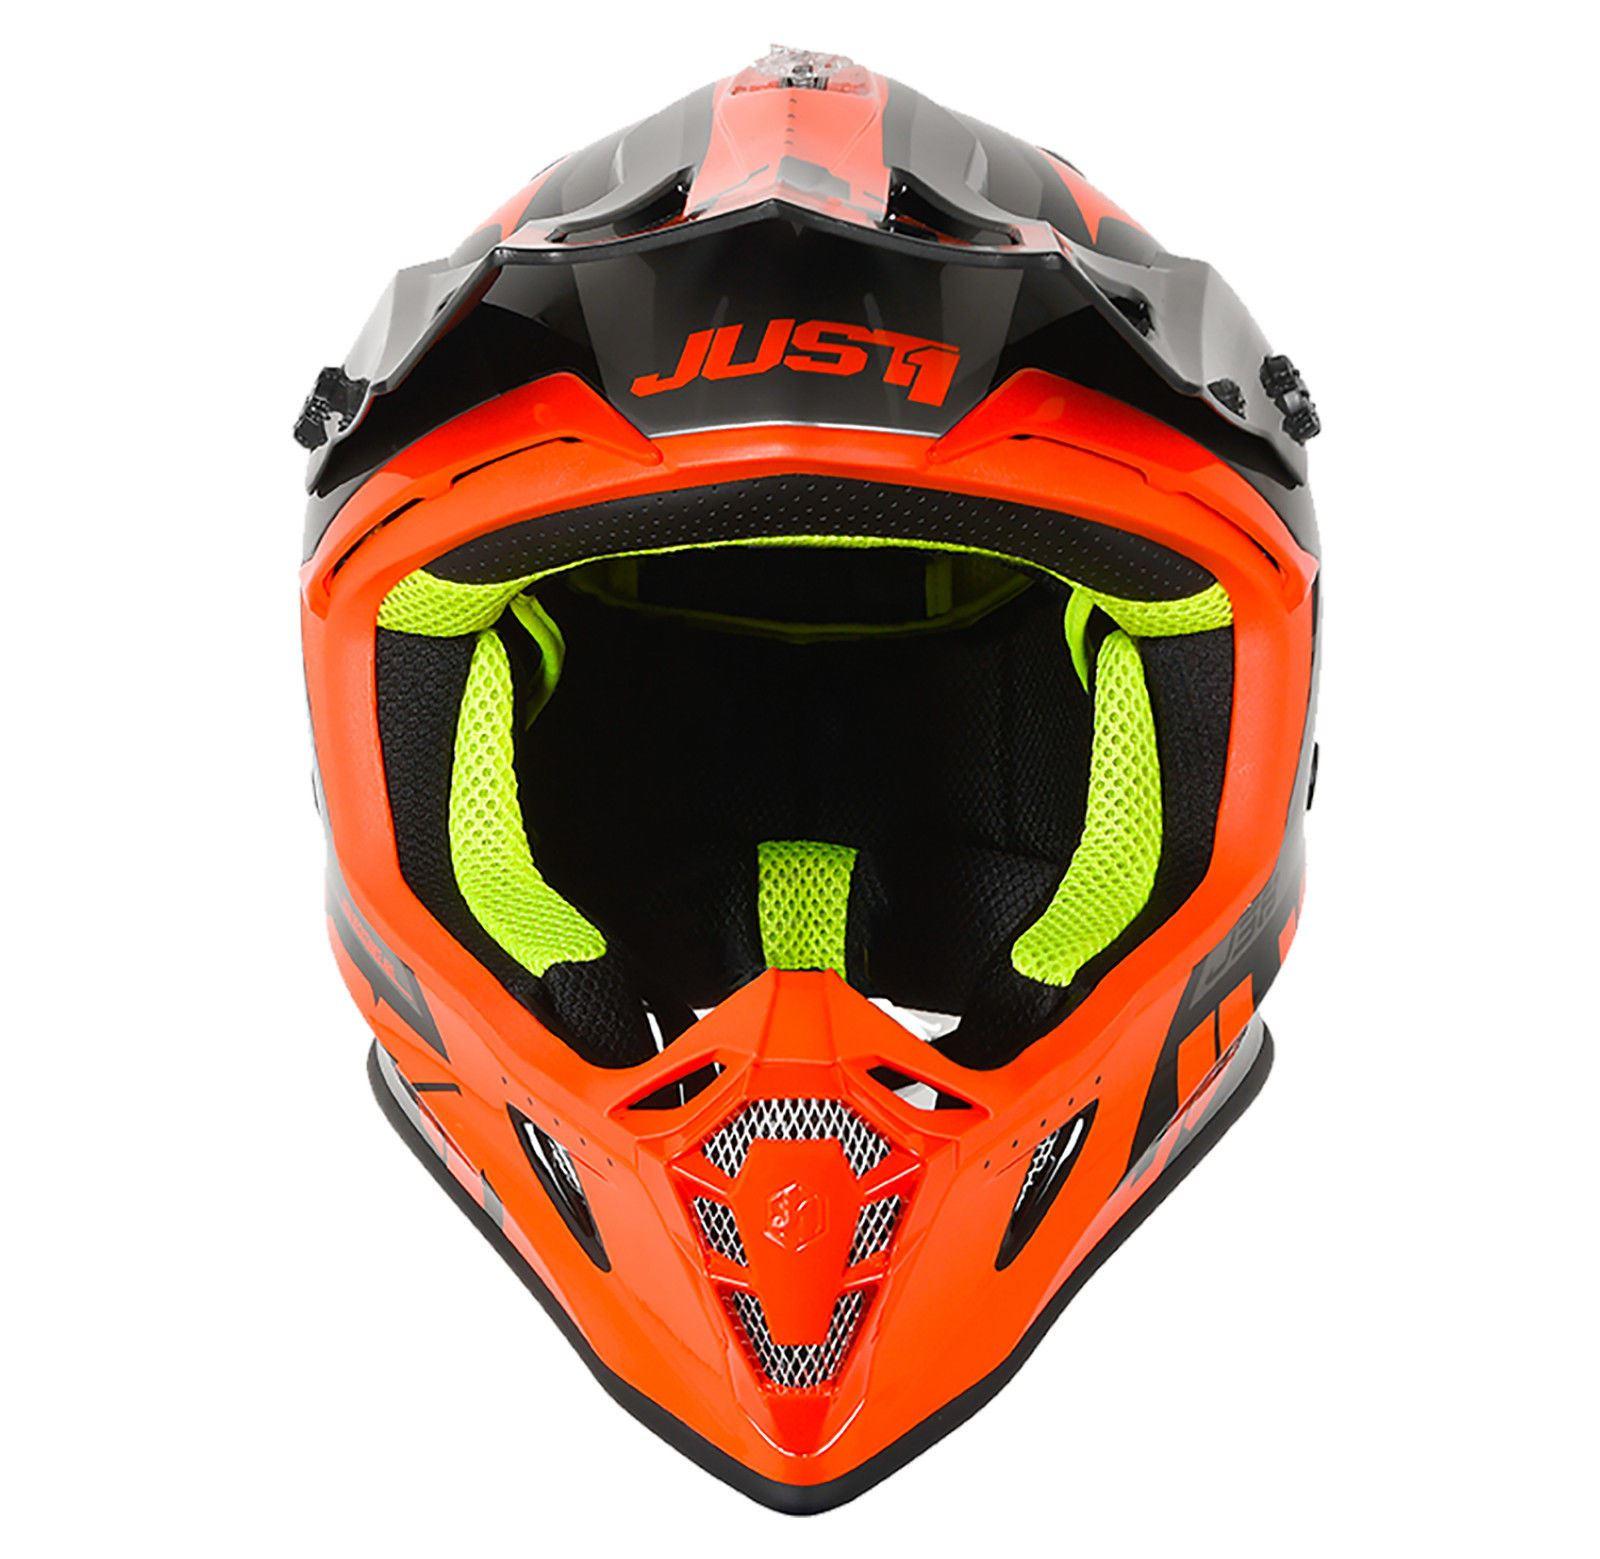 Just1-J38-Blade-Helmet-Motocross-Enduro-MX-ATV-Motorcycle-Off-Road-Full-Face-ACU thumbnail 36